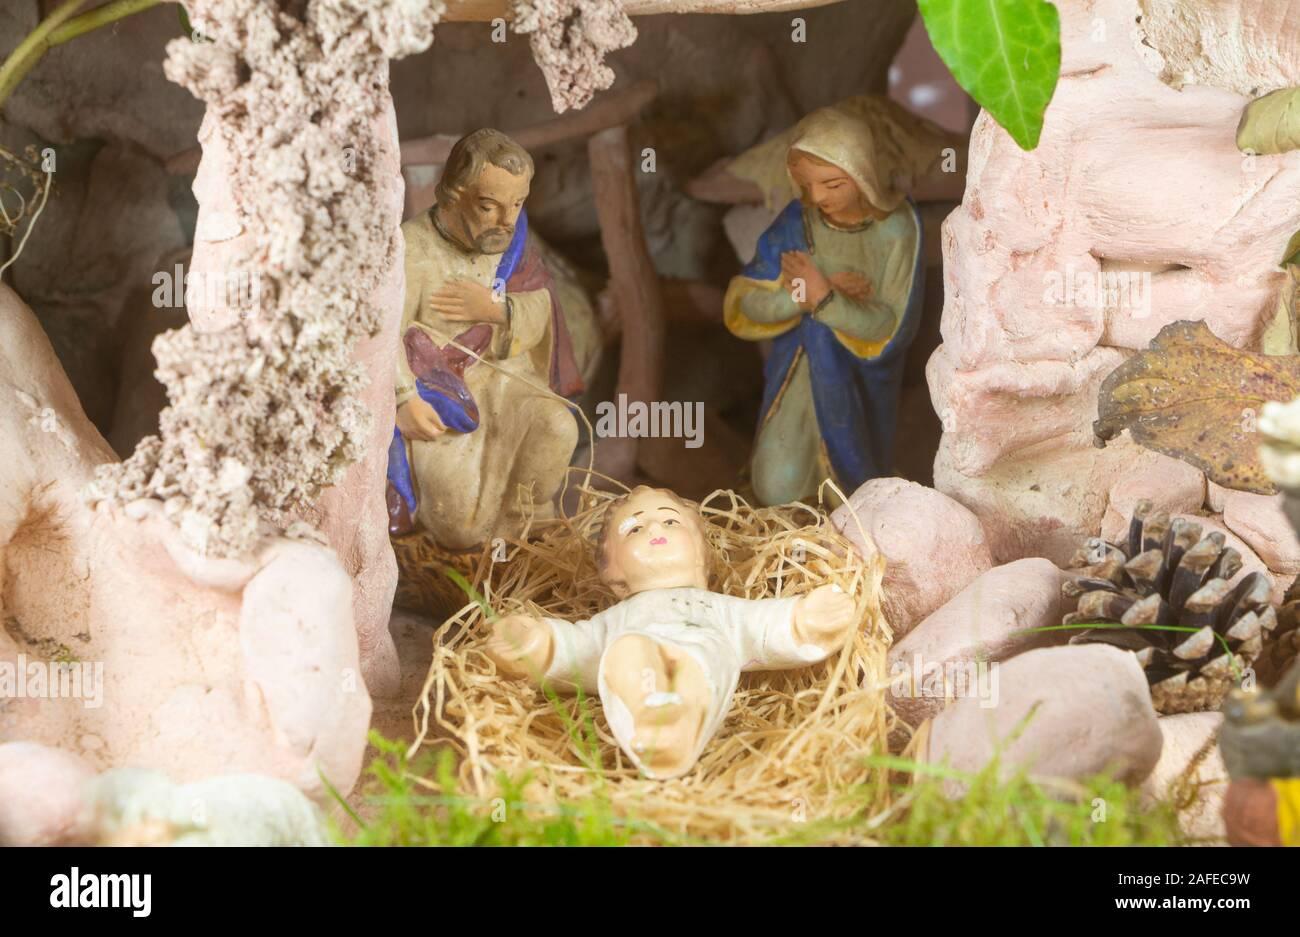 Nativity scene with provencal Christmas crib figures in terracotta Stock Photo